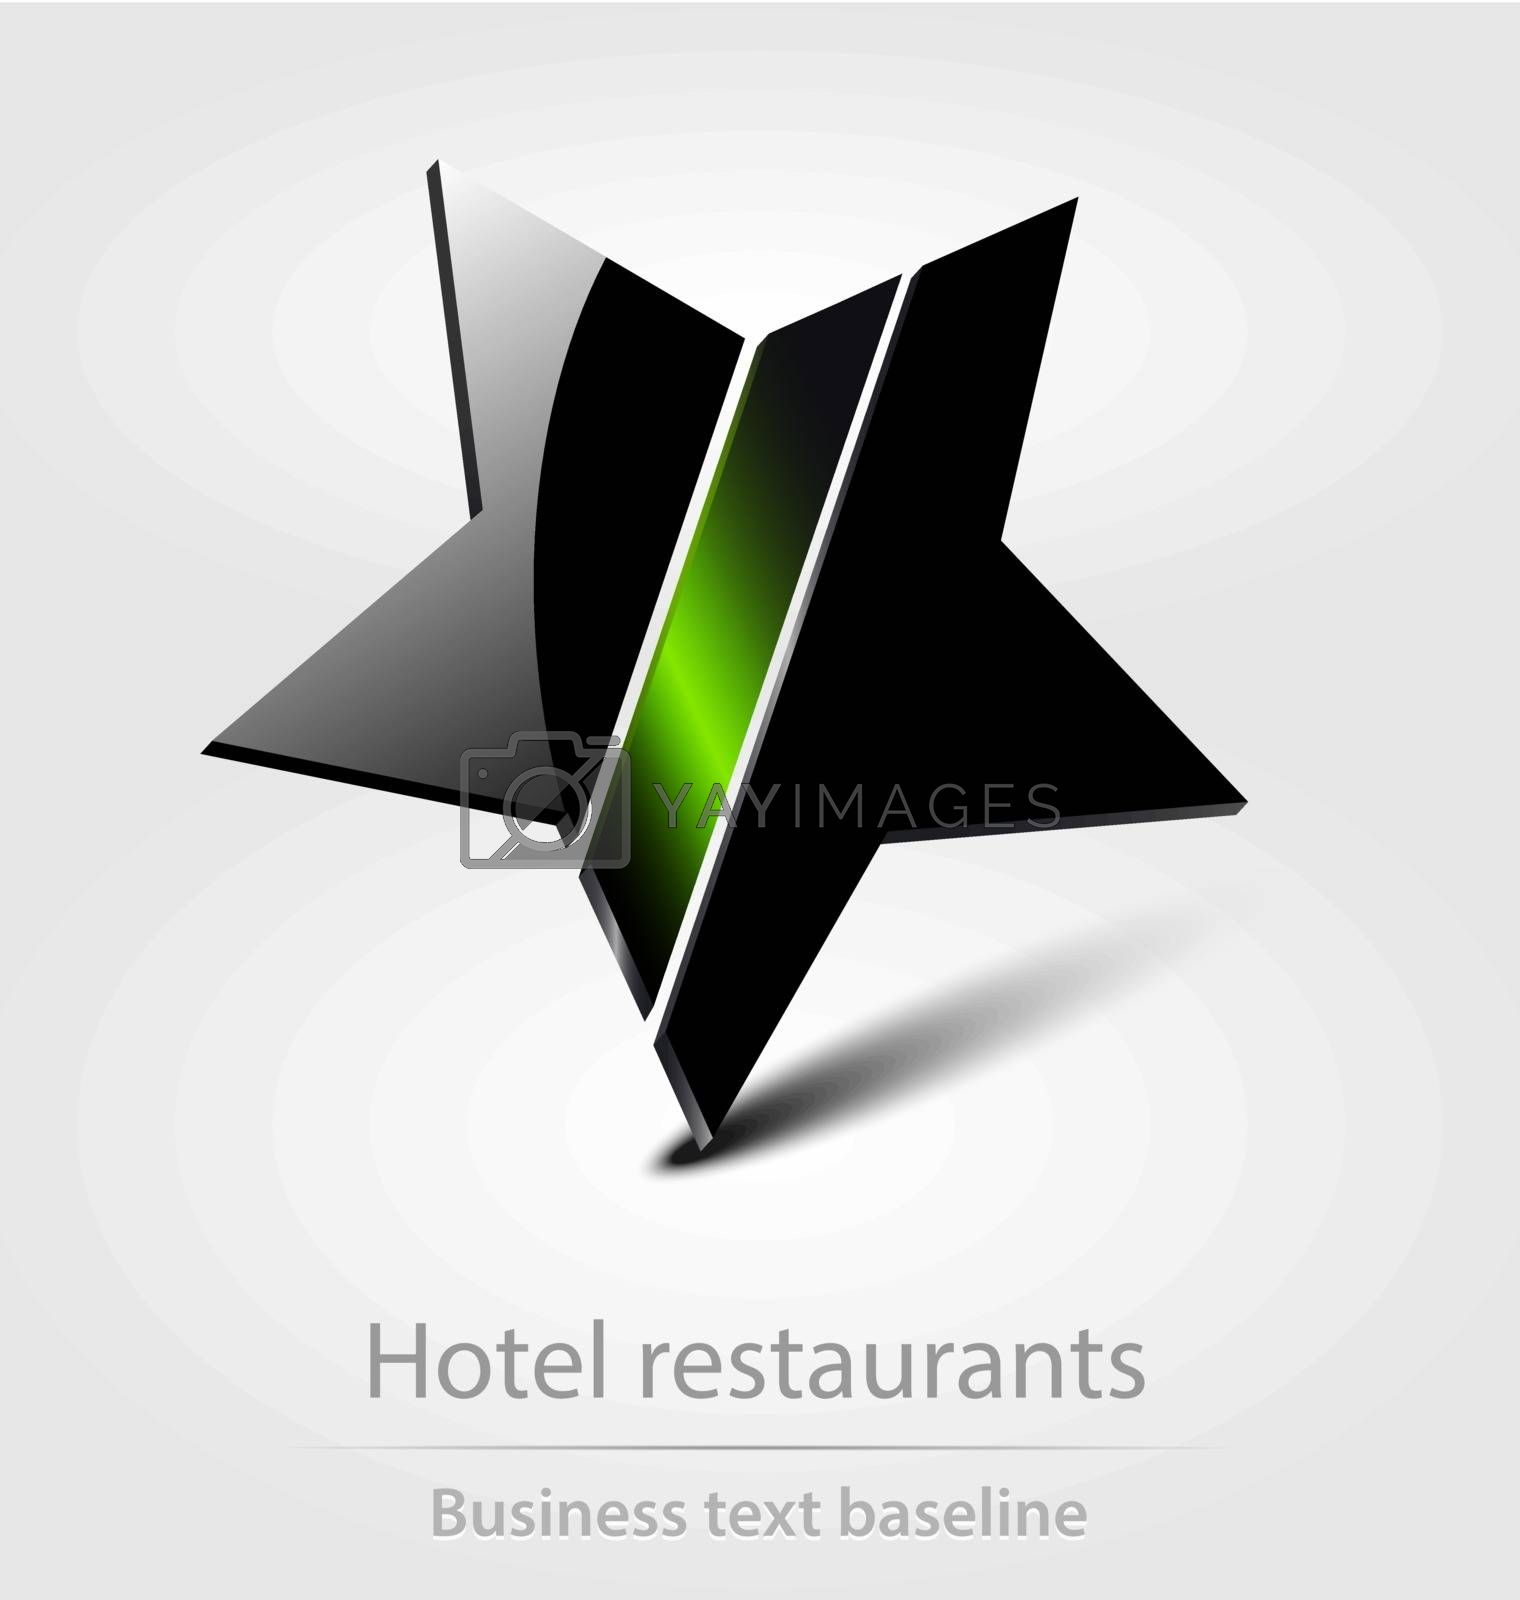 Hotel restaurants business icon for creative design